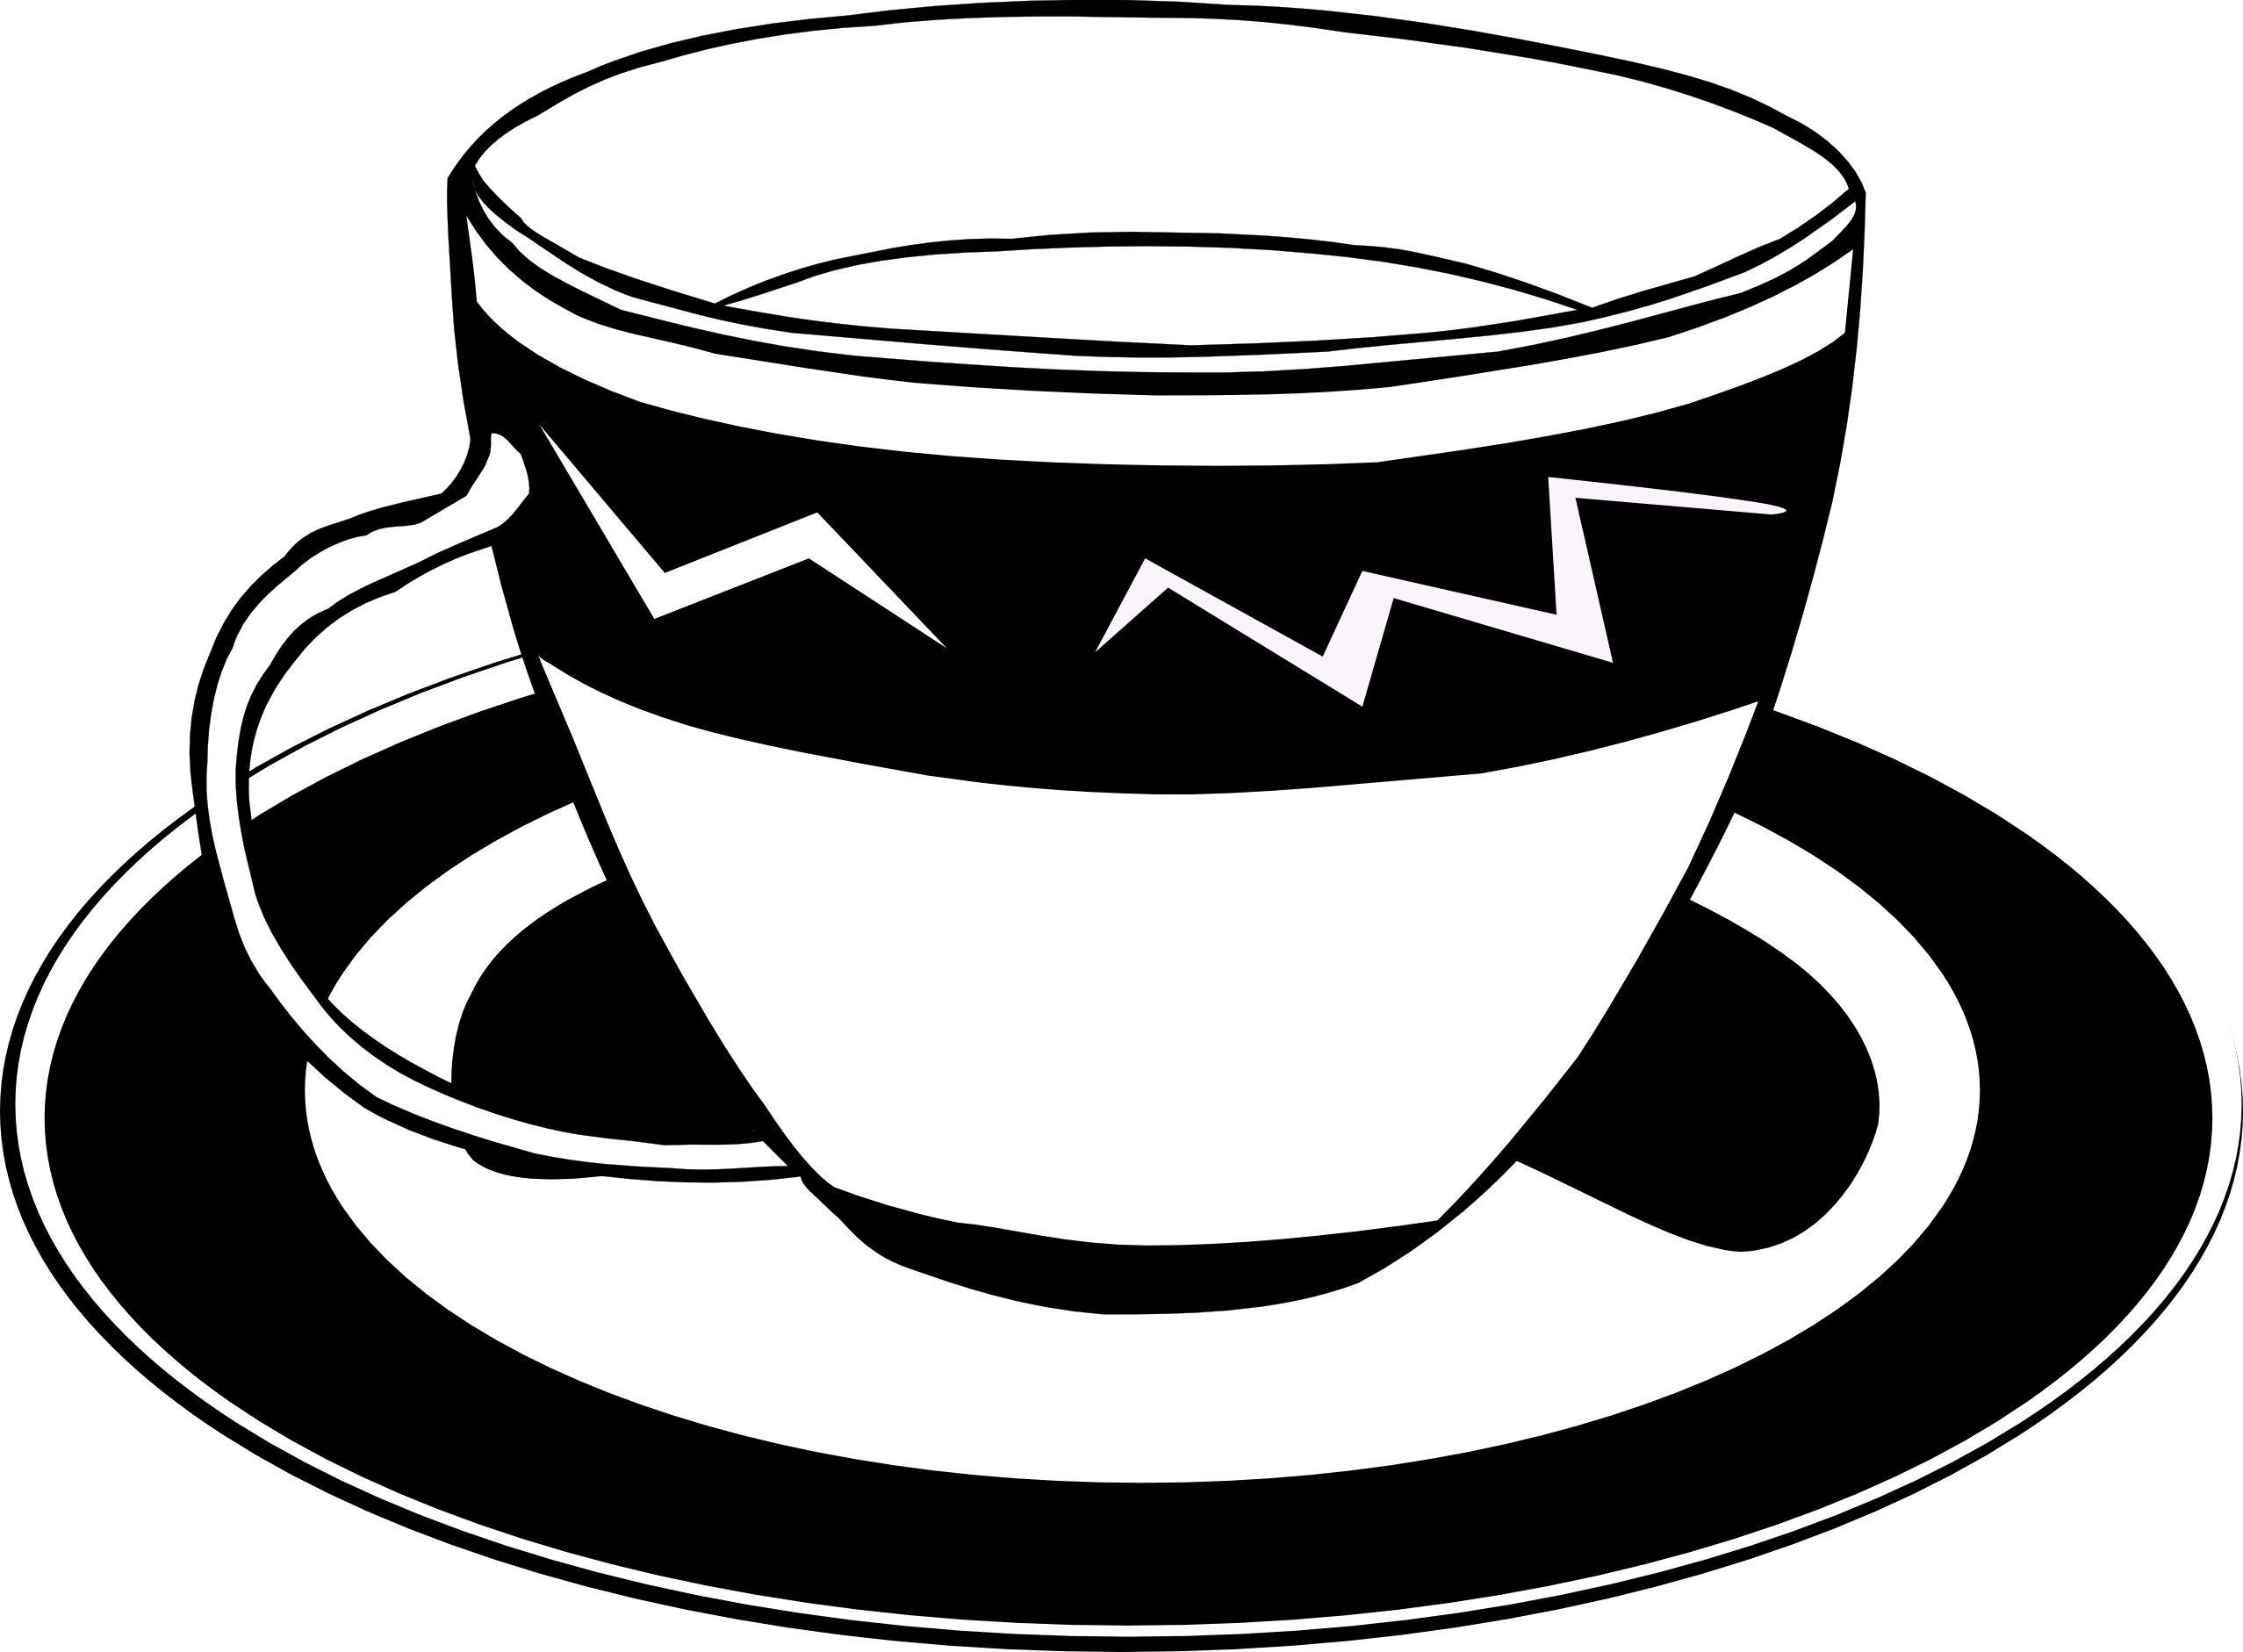 Food spoon bowl black. Clipart wedding brunch